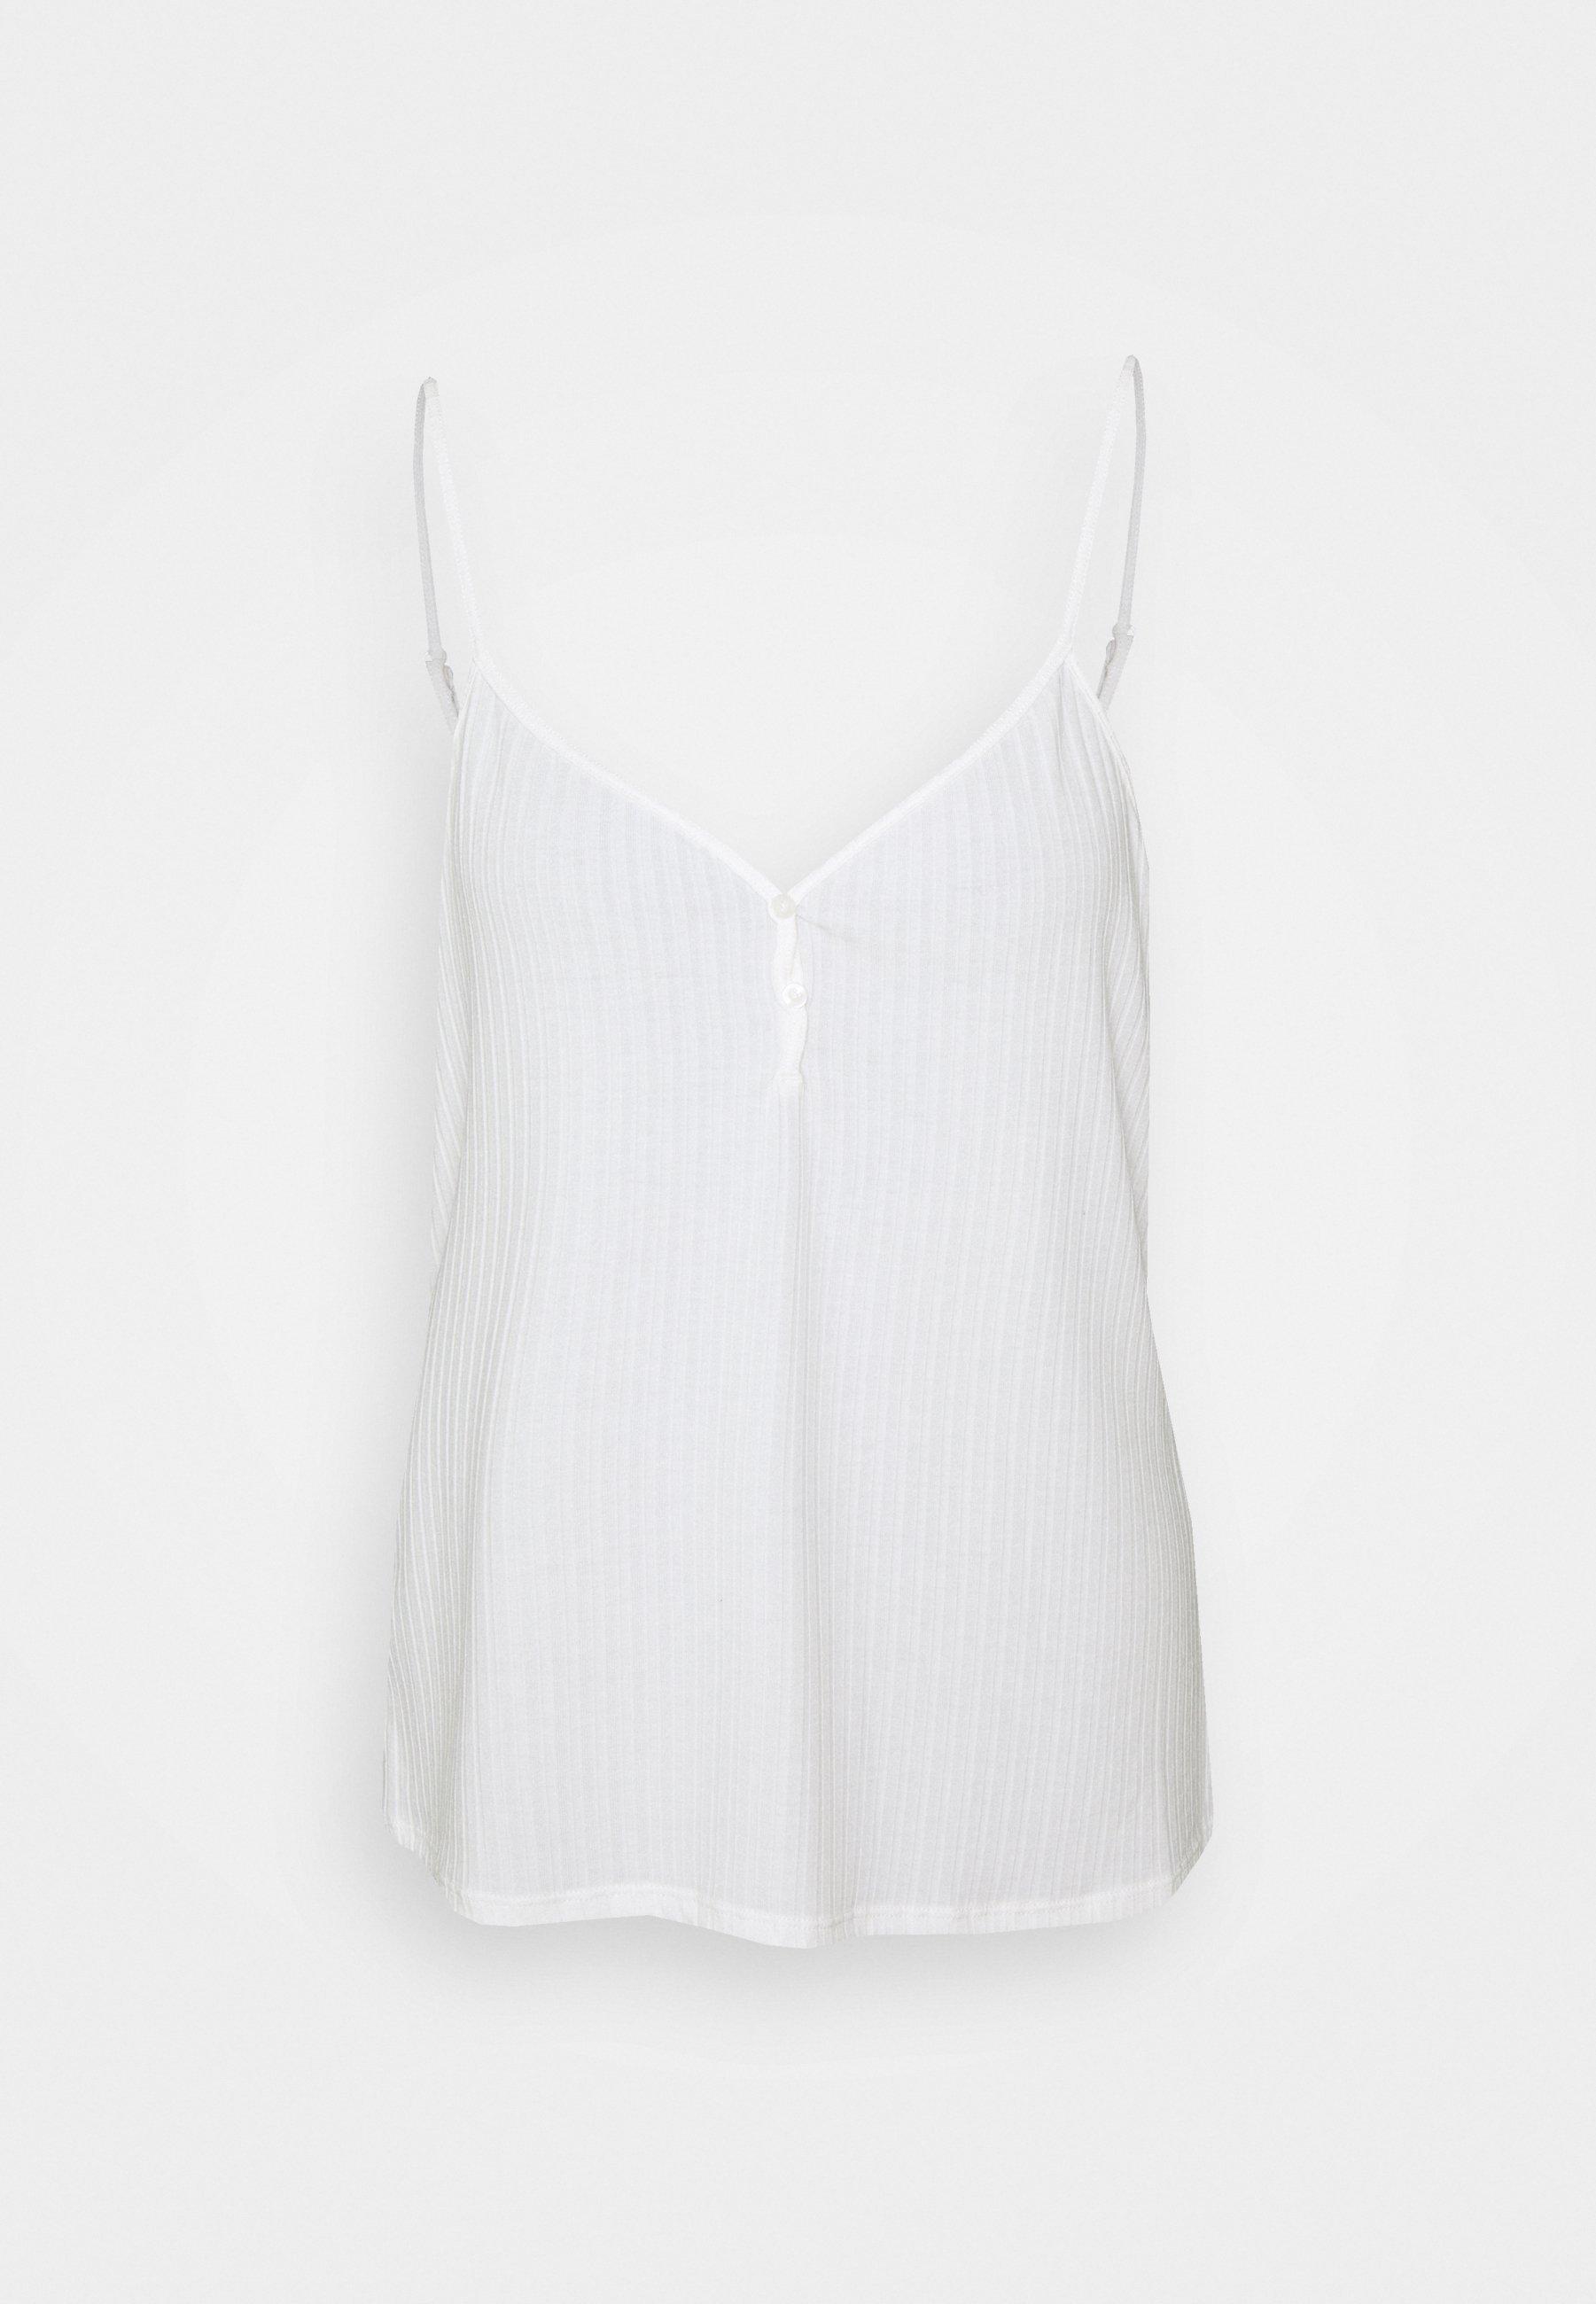 Damen SILENCE - Nachtwäsche Shirt